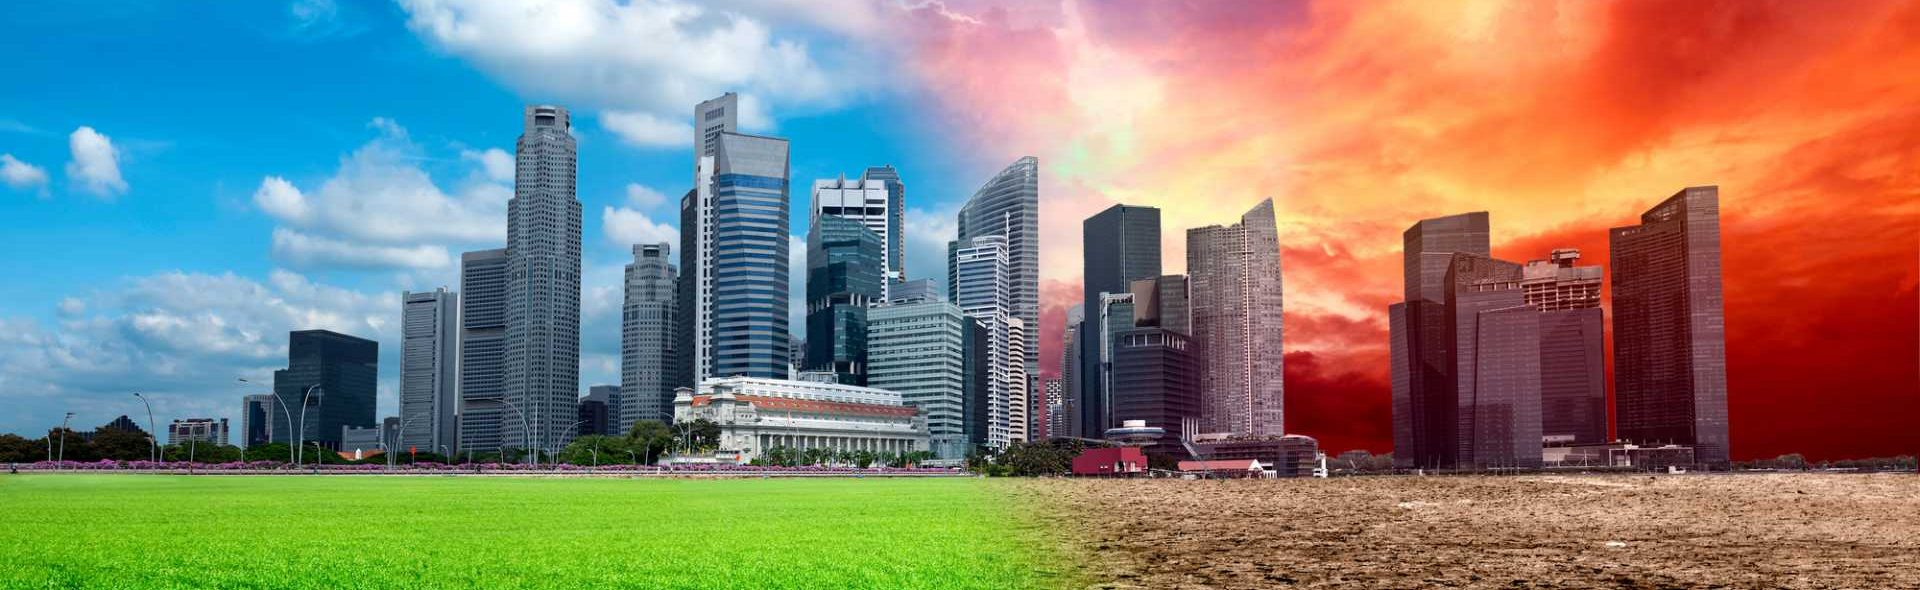 Global warming pollution climate change sustainability - image courtesy of Depositphotos.